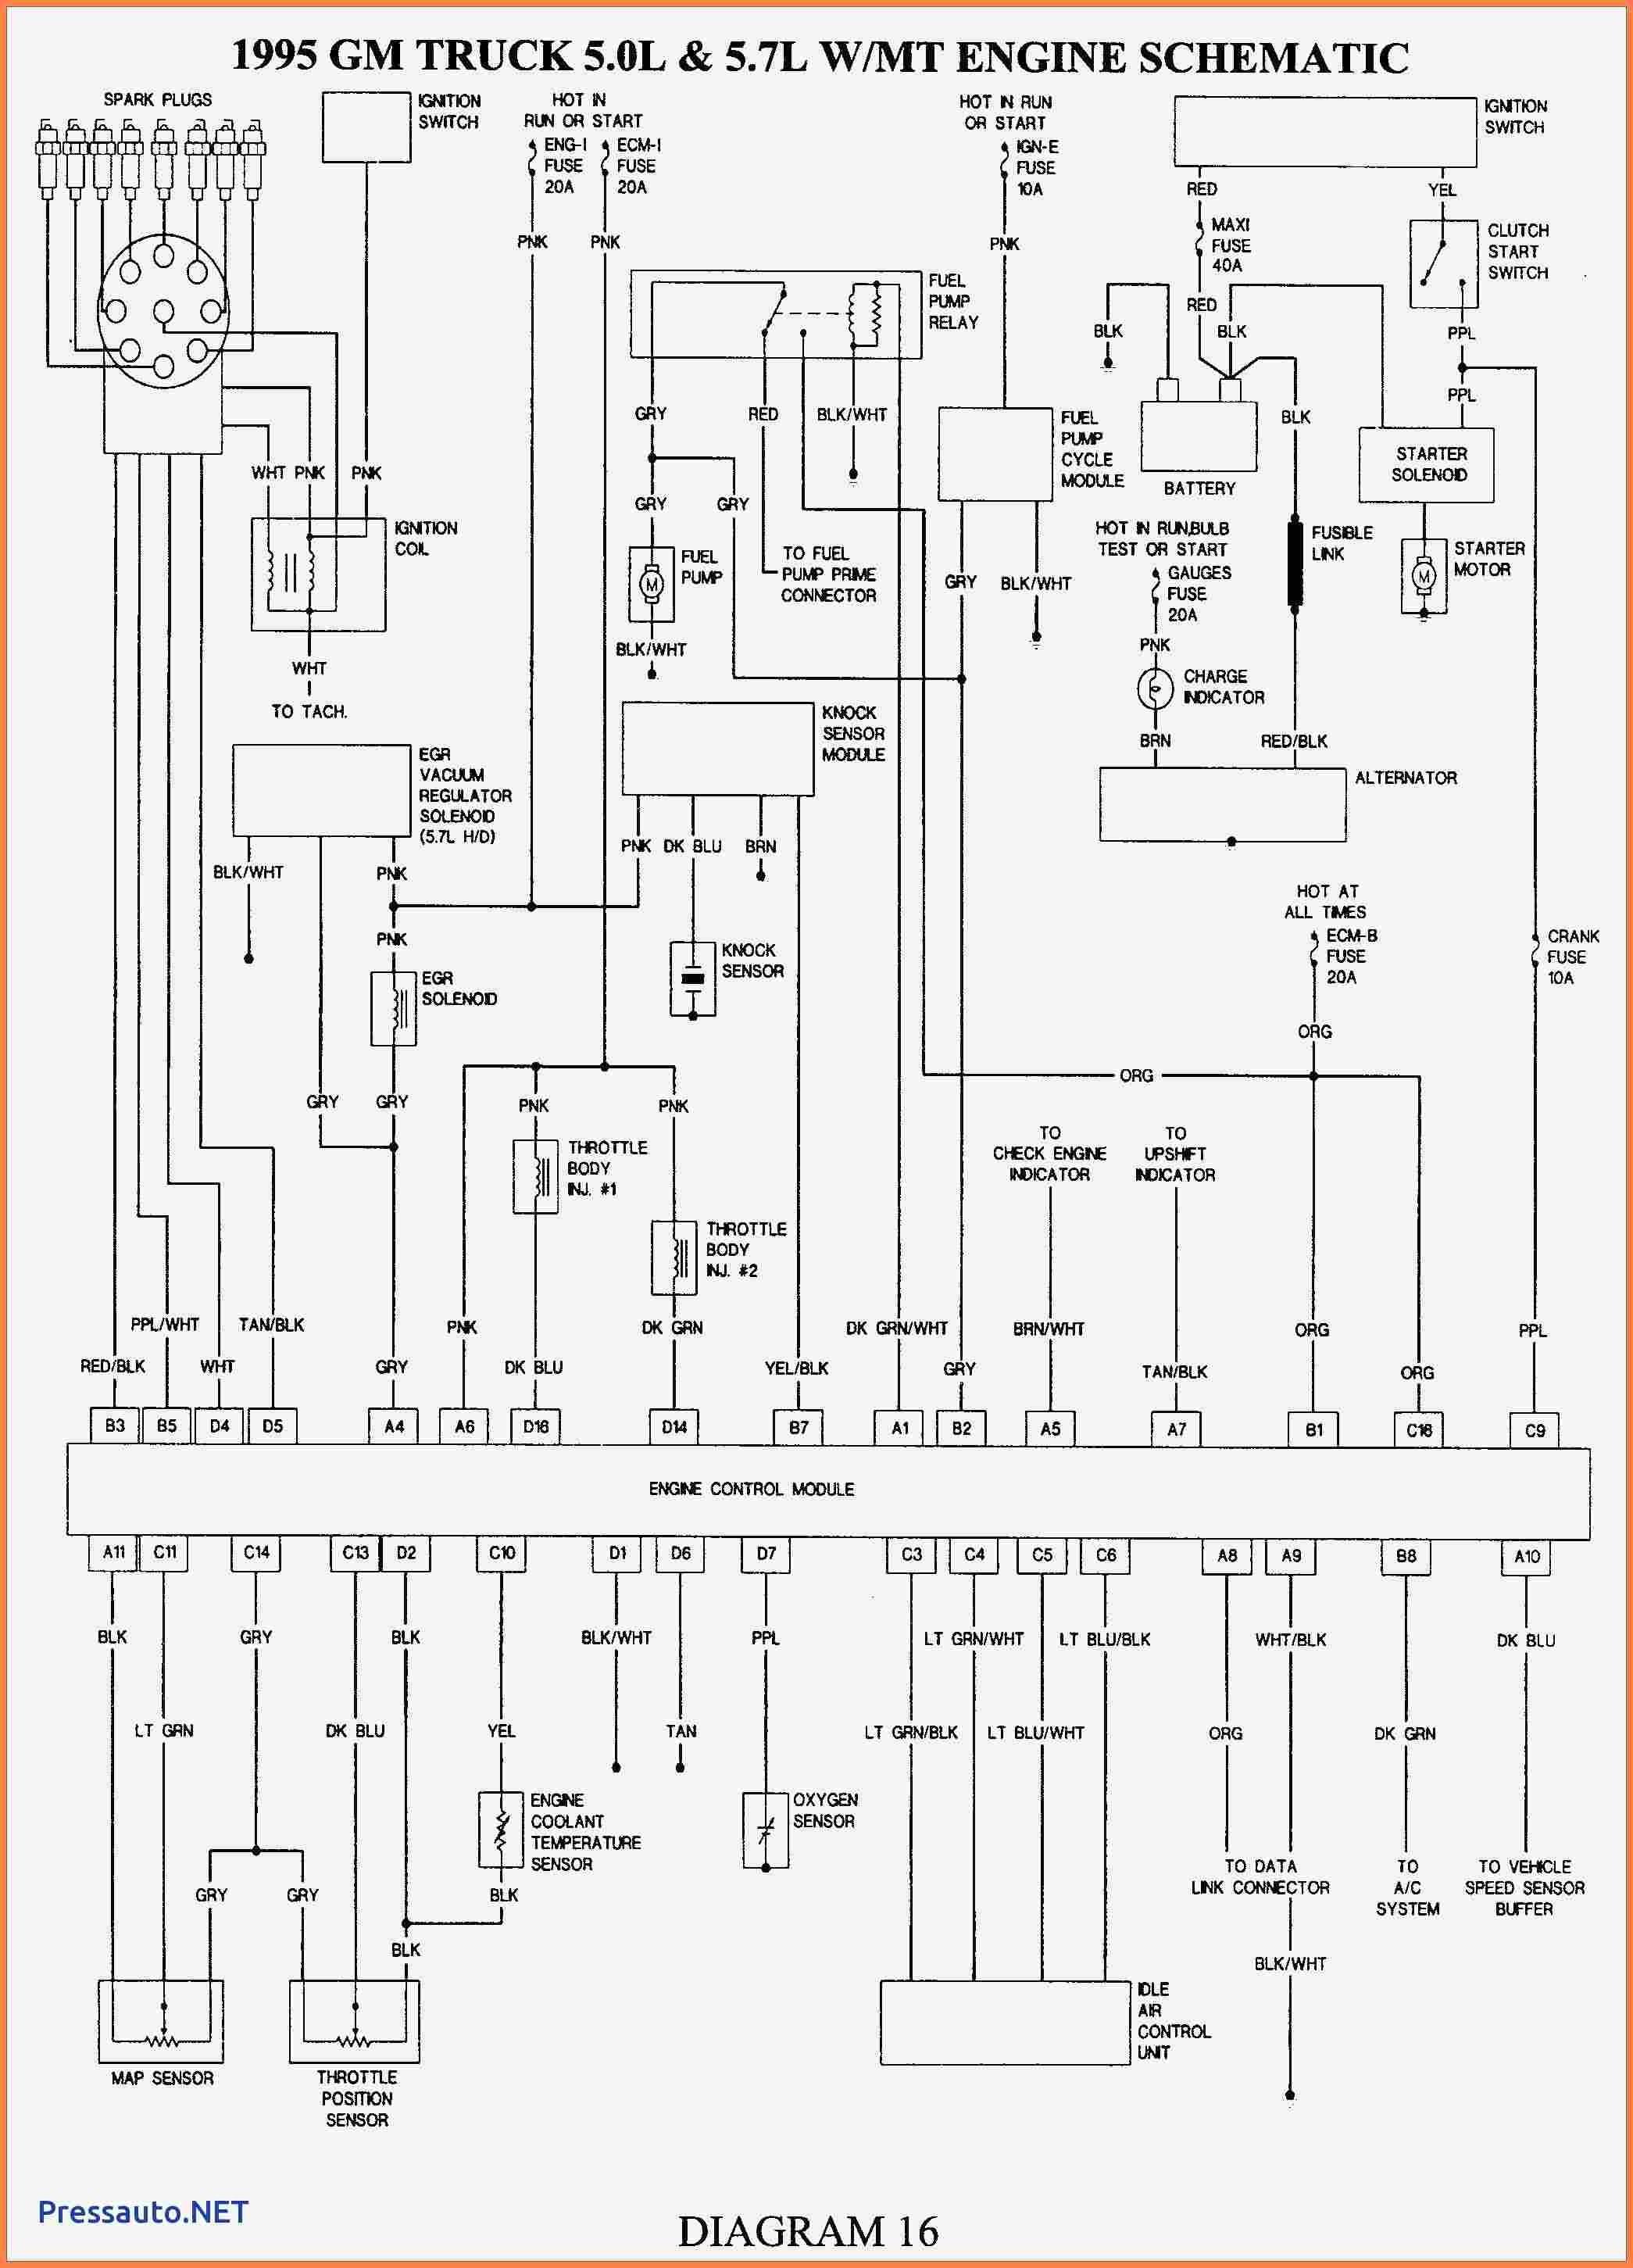 2004 Gmc Sierra Wiring Diagram 2004 Chevy Silverado 1500 Wiring Diagram Wiring Diagram Database Of 2004 Gmc Sierra Wiring Diagram